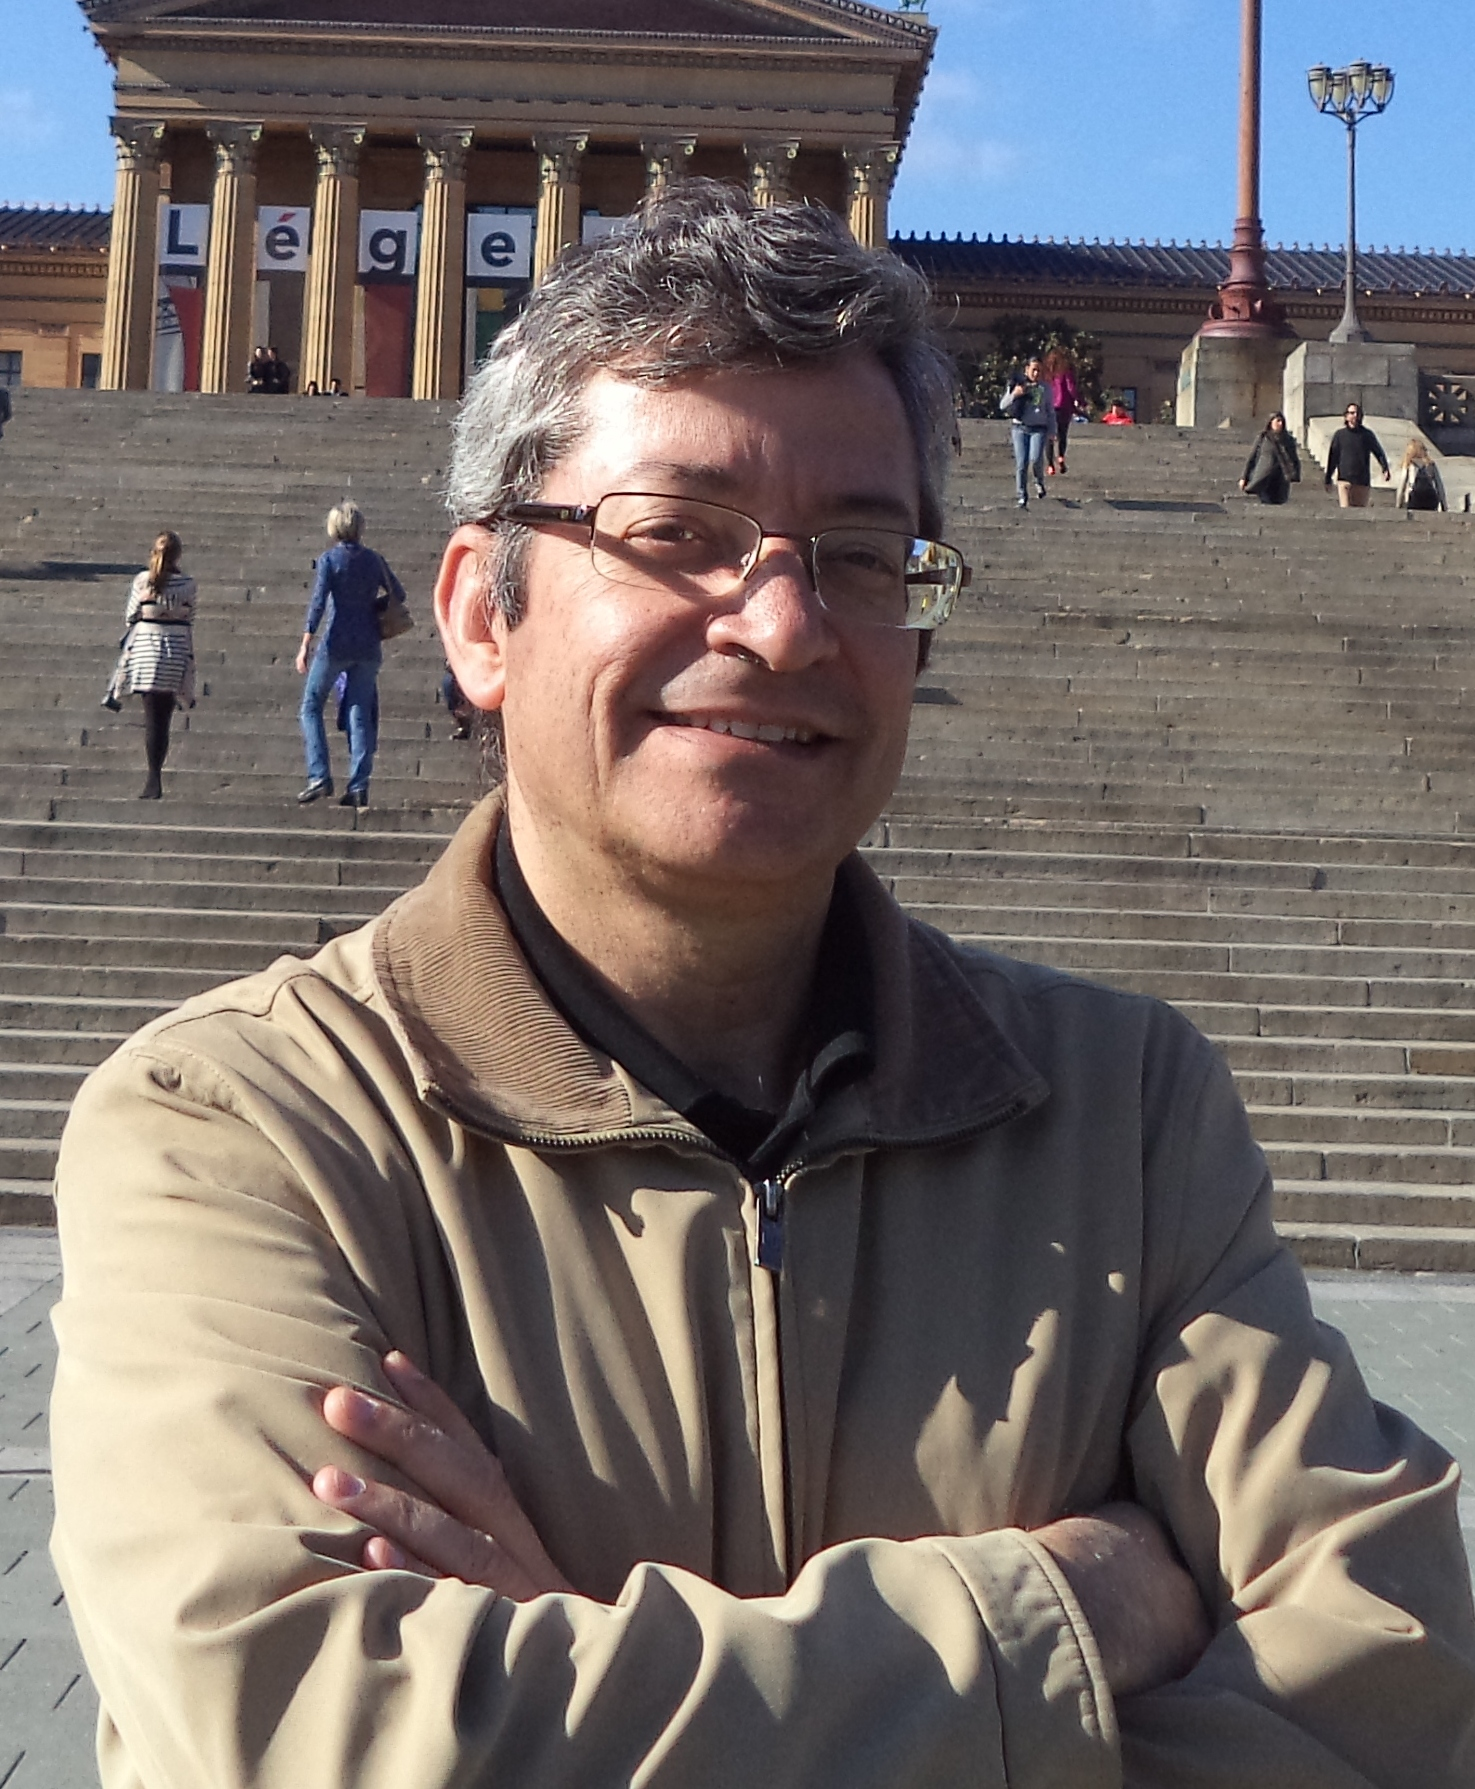 [:pt]Prof. Dr. Joaquim Edson Vieira[:][:en]Prof. Joaquim Edson Vieira[:][:es]Prof. Dr. Joaquim Edson Vieira[:]